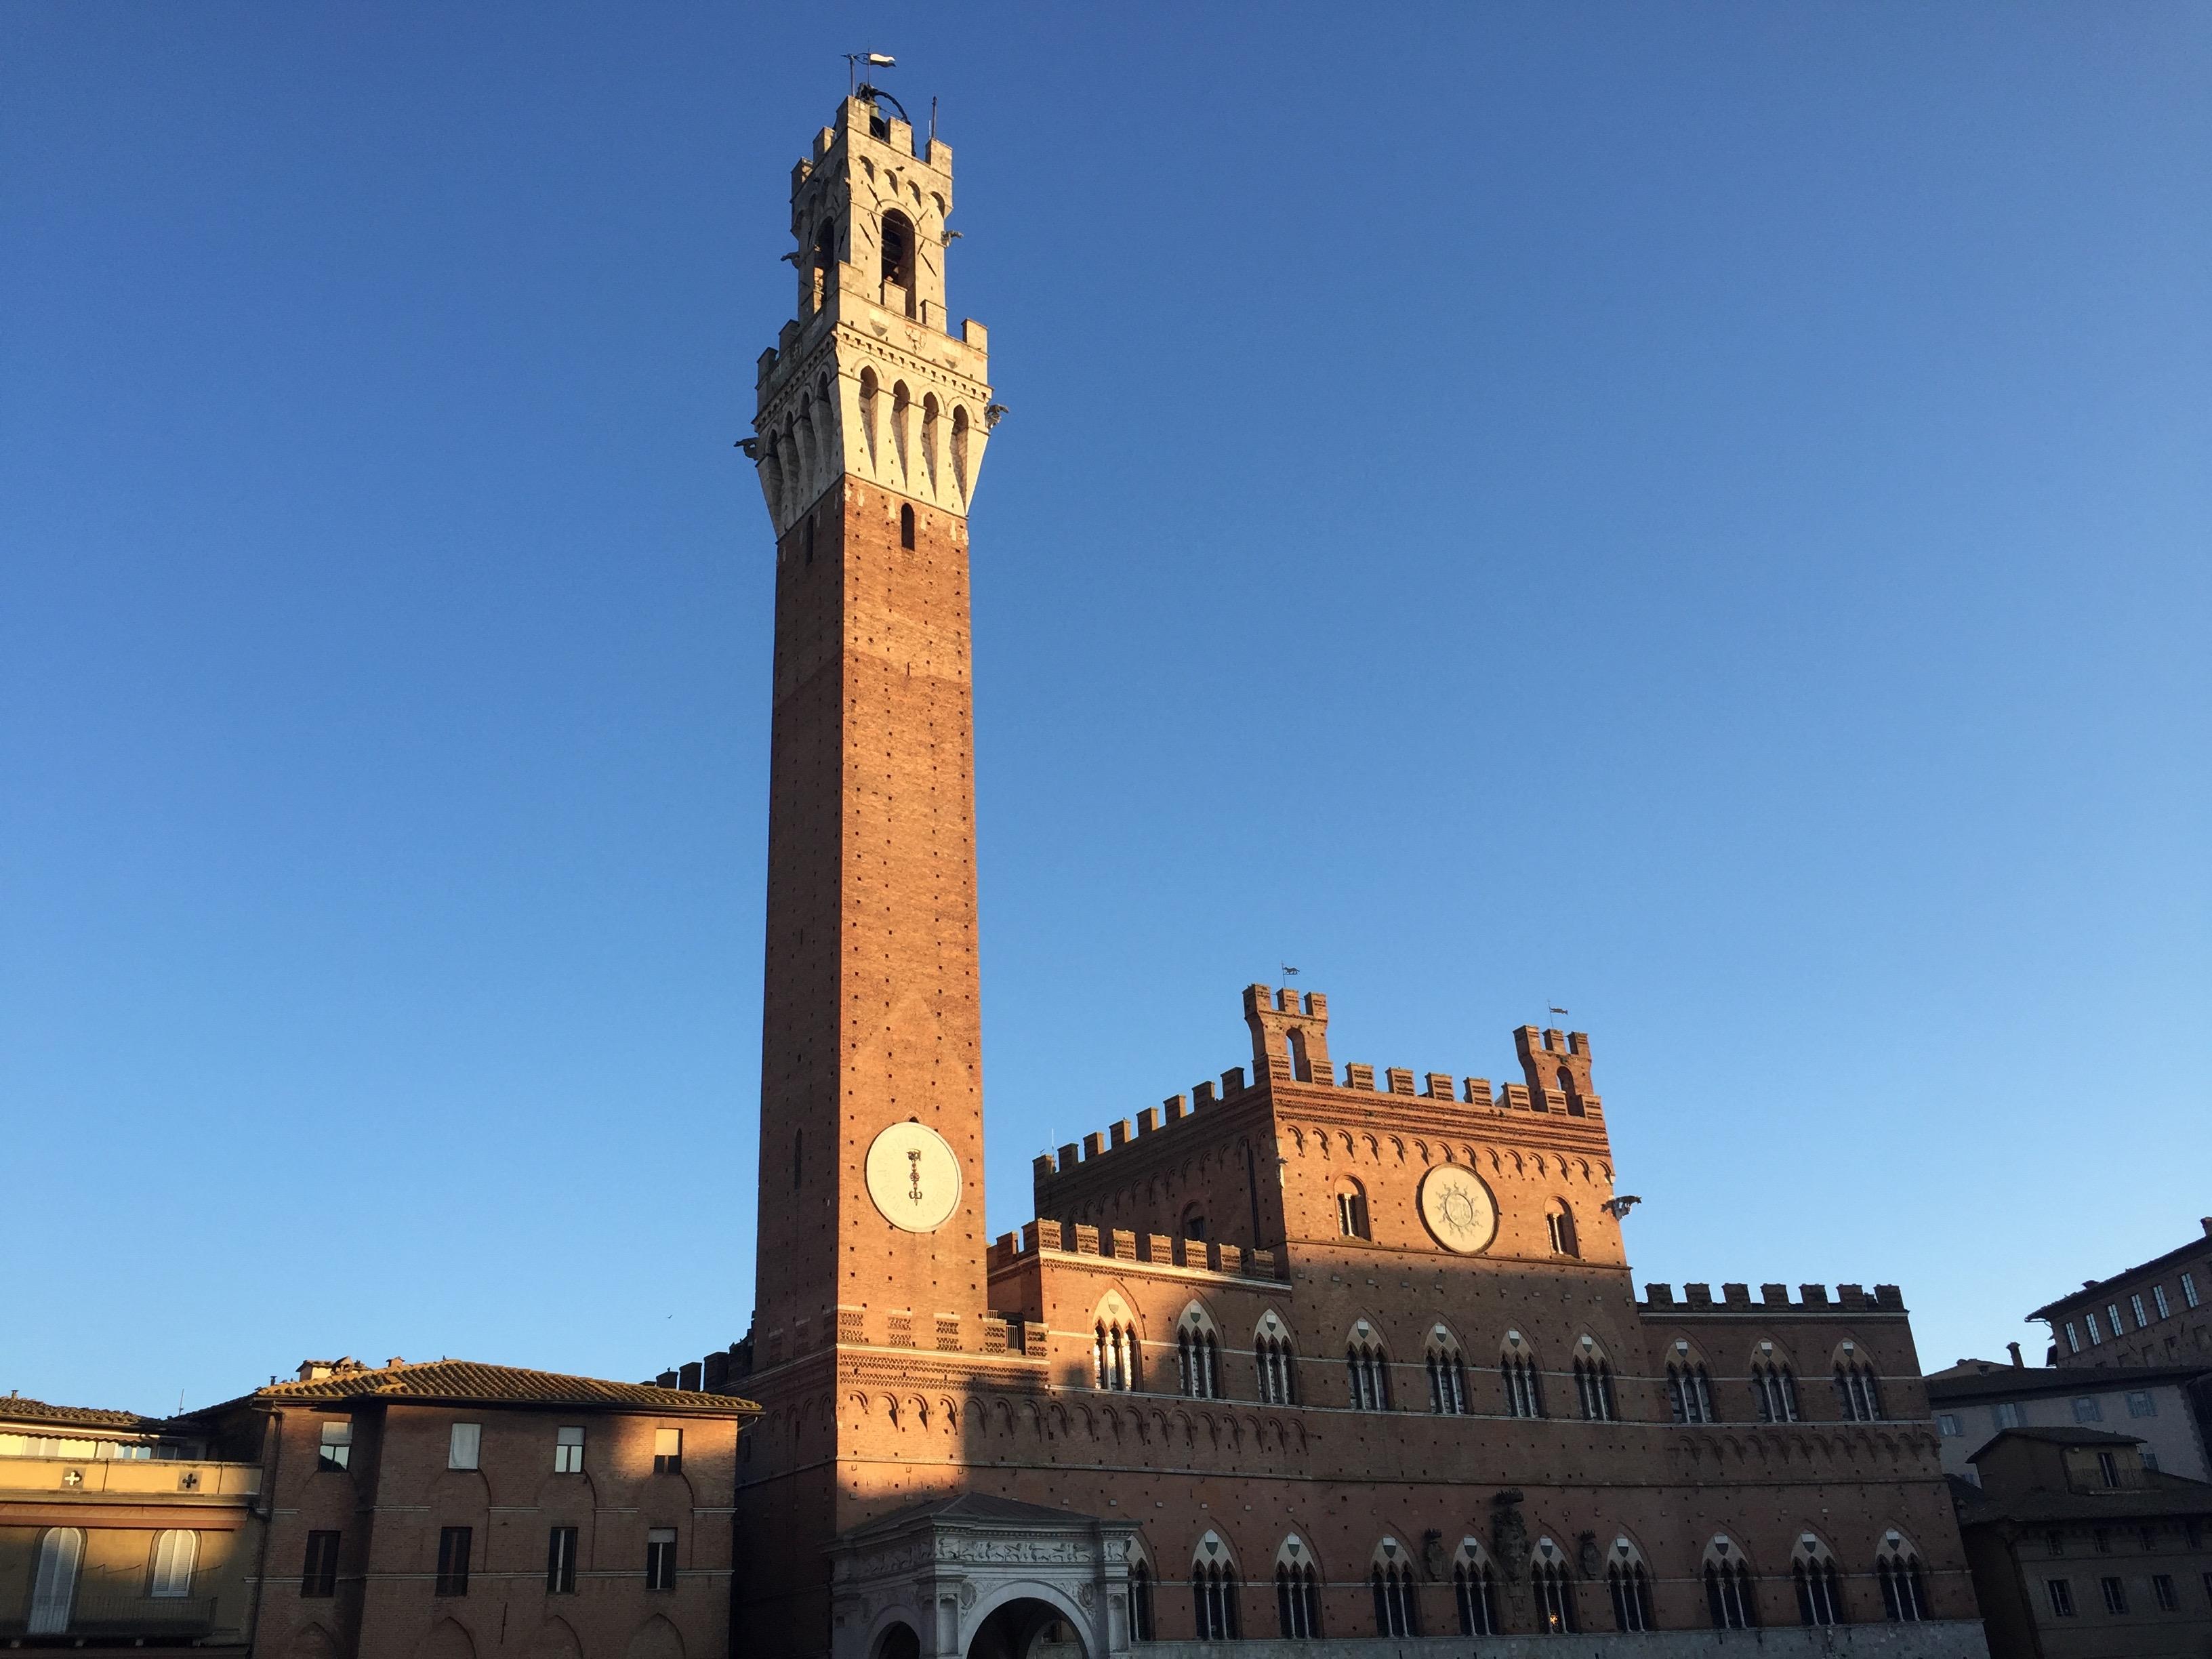 Siena_Piazza del Campo